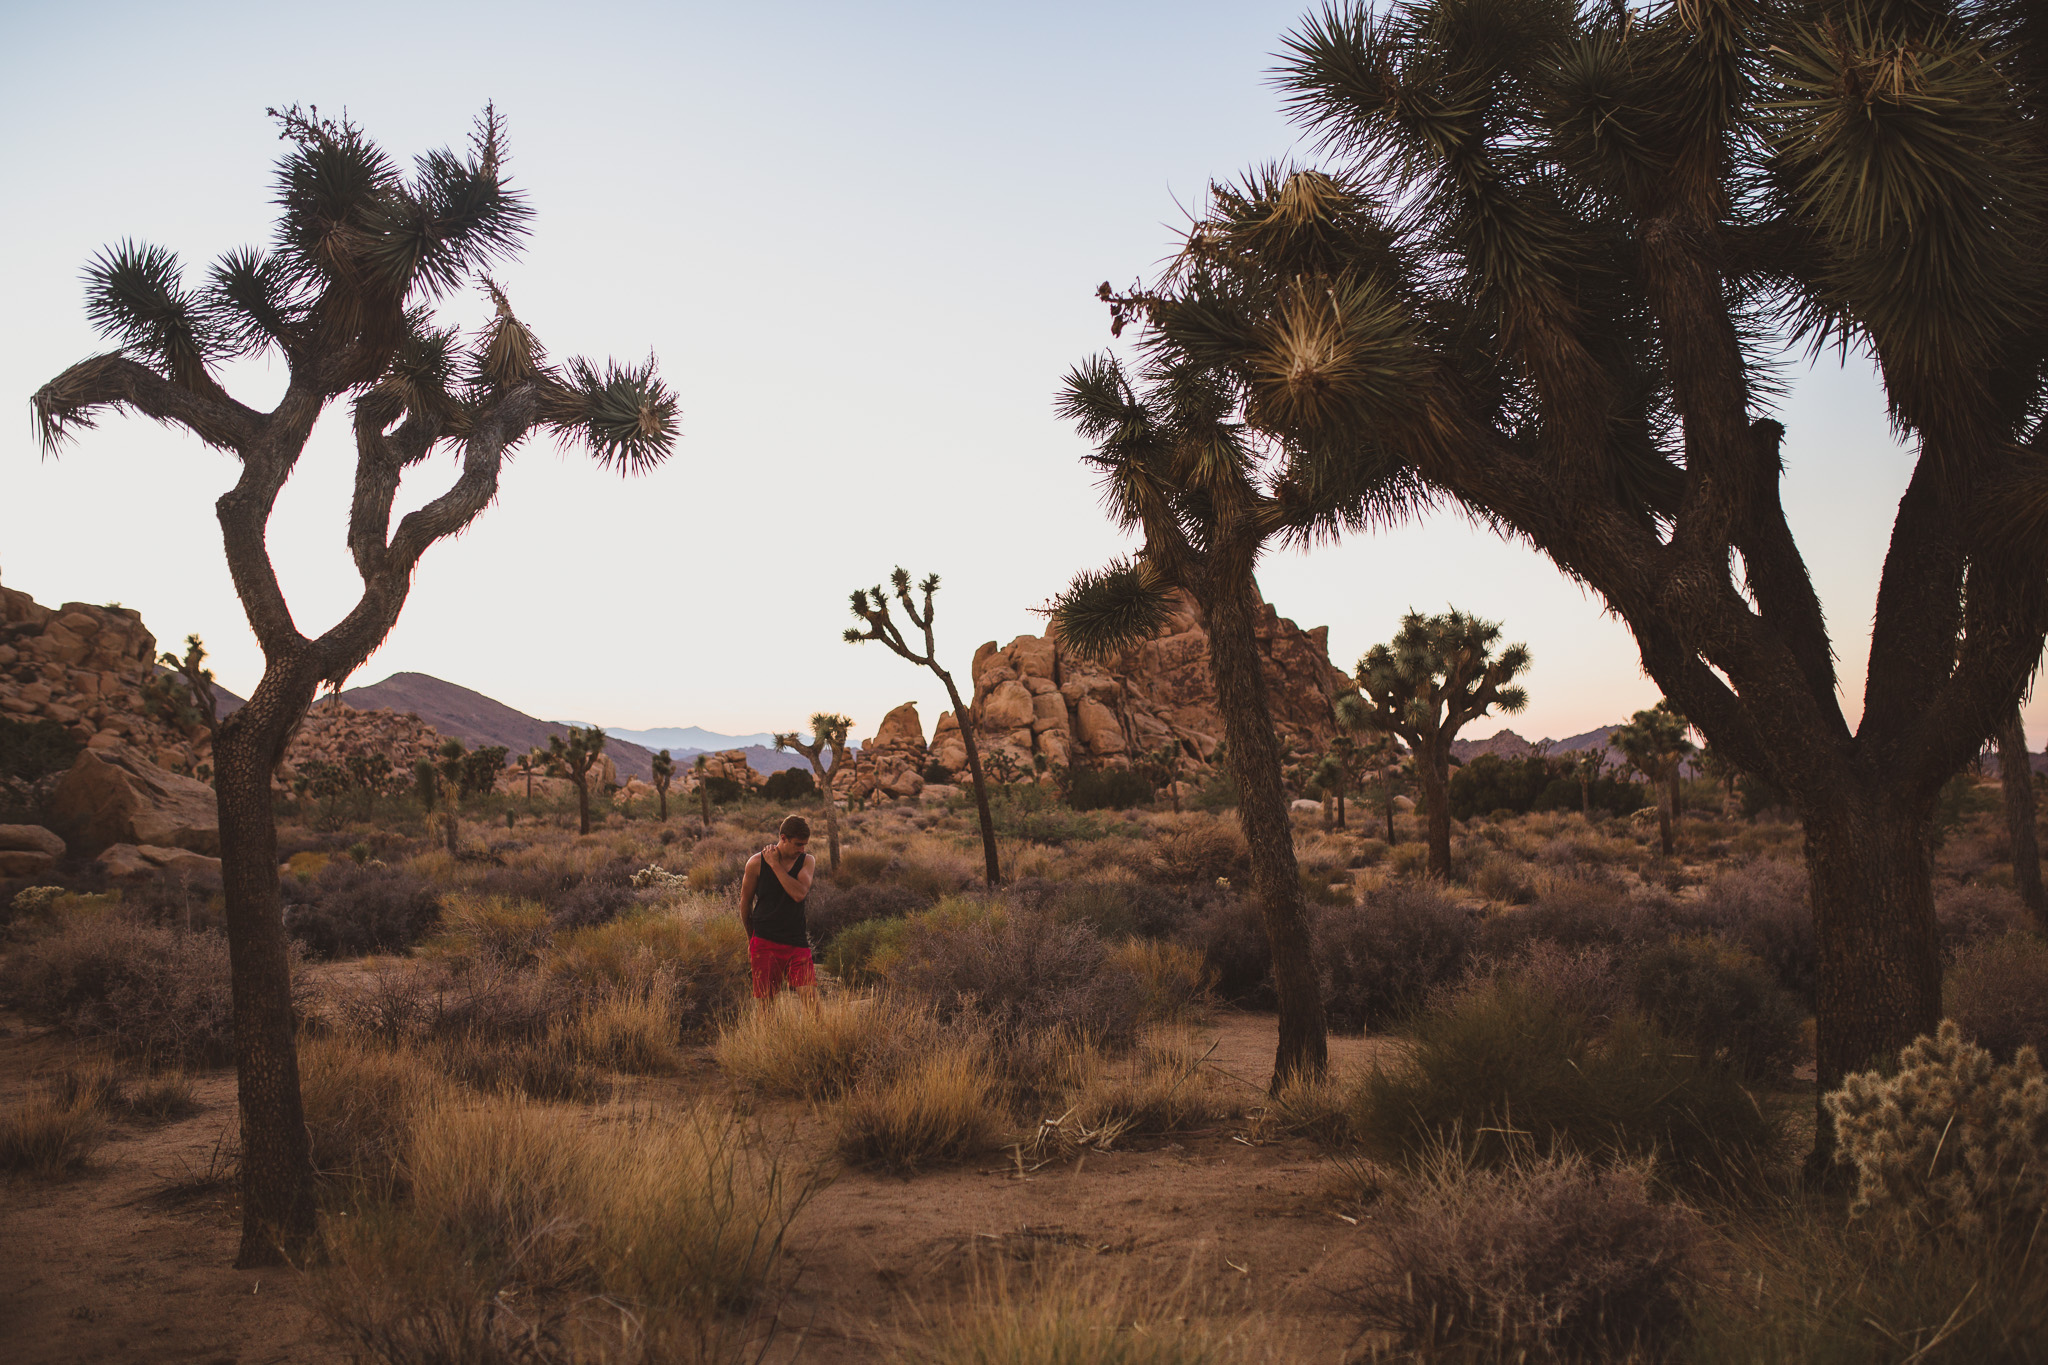 Joshue-tree-Jonathan-Kuhn-Photography